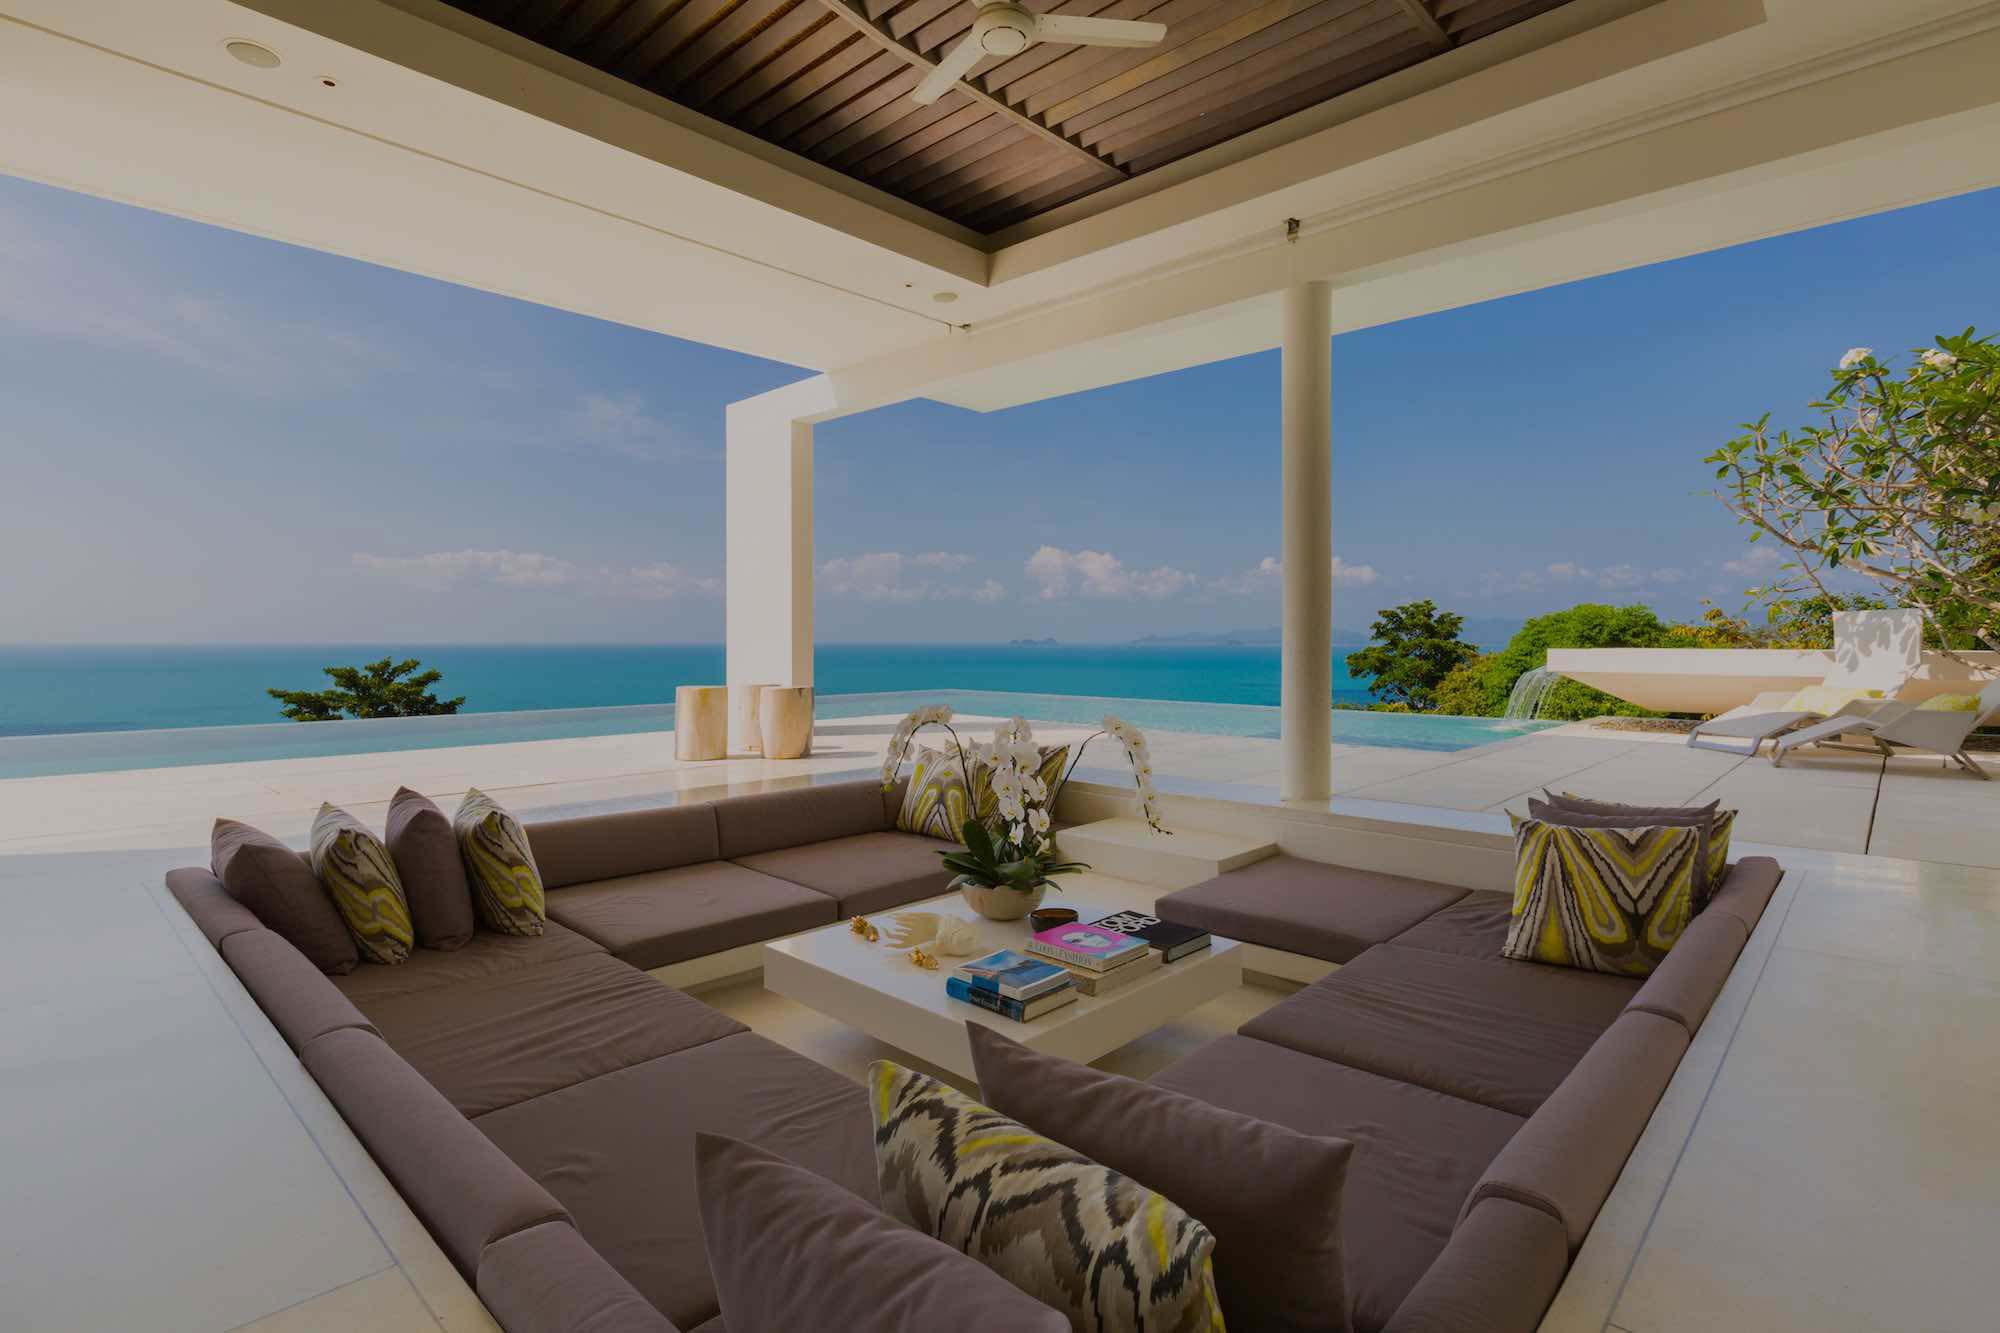 10 Villas with a Glamorous Sunken Lounge